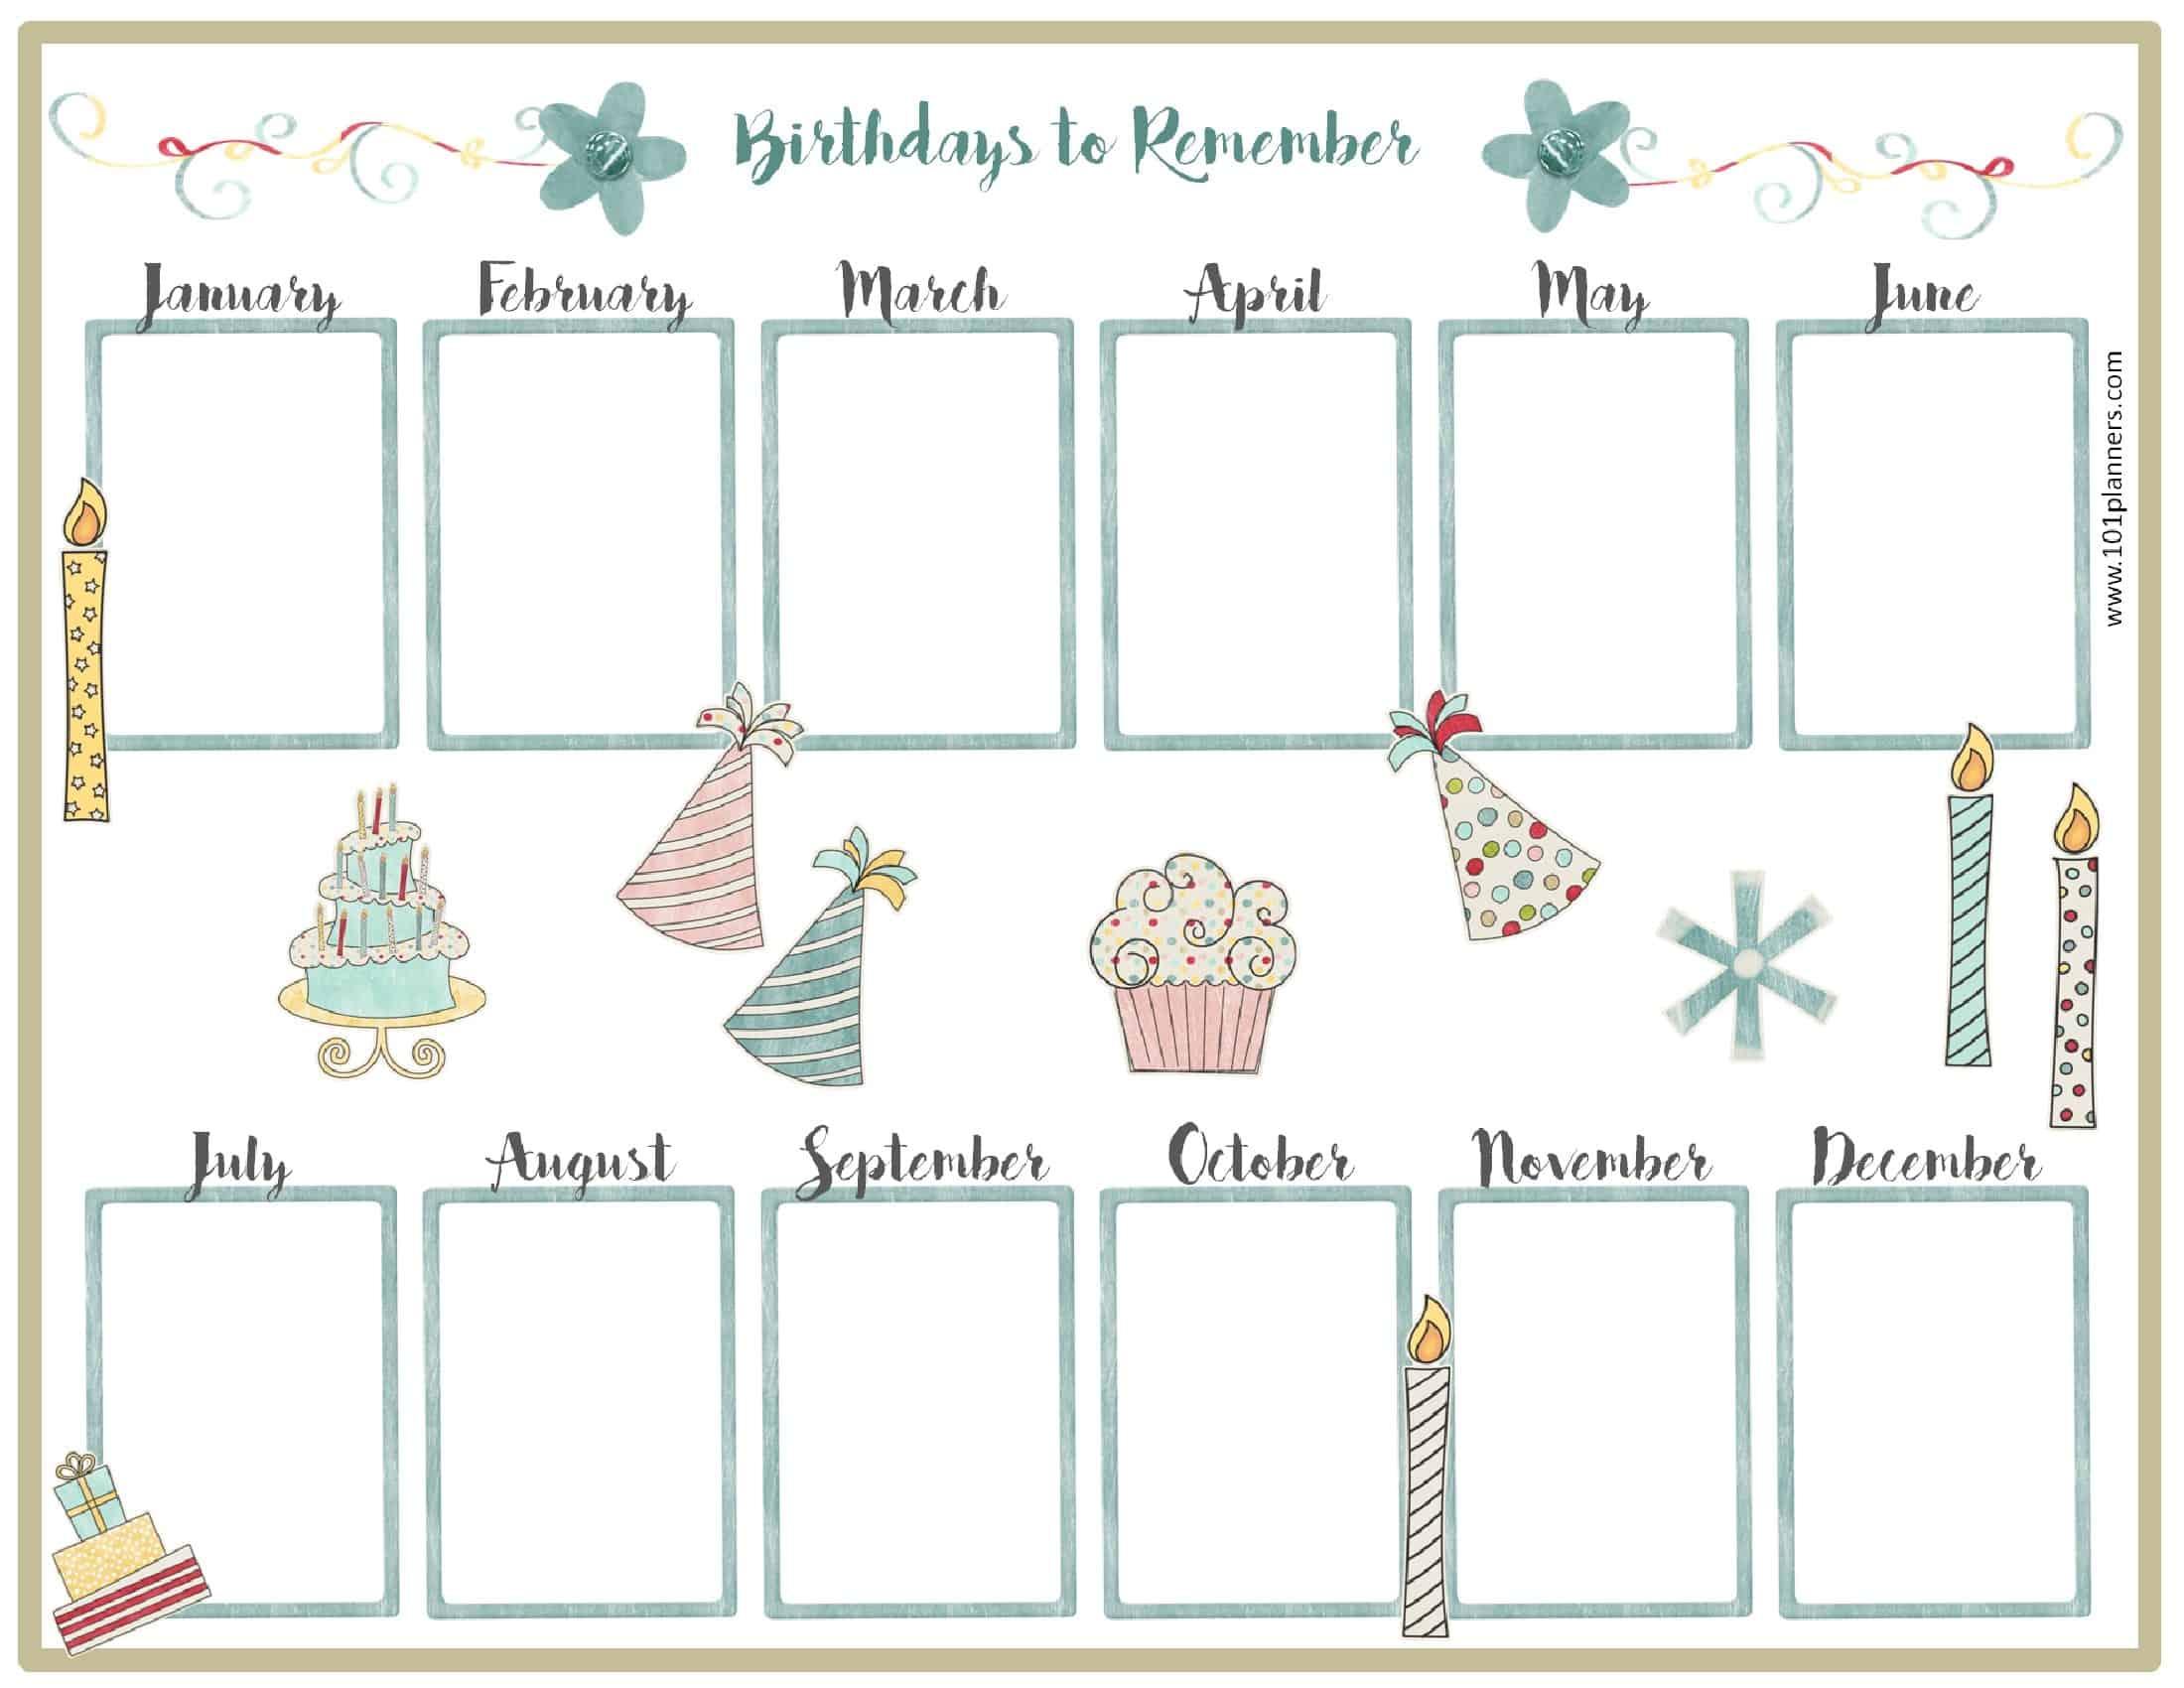 Birthday Calendar Template Free Microsoft Word regarding Blank Monthly Birthday Calendars